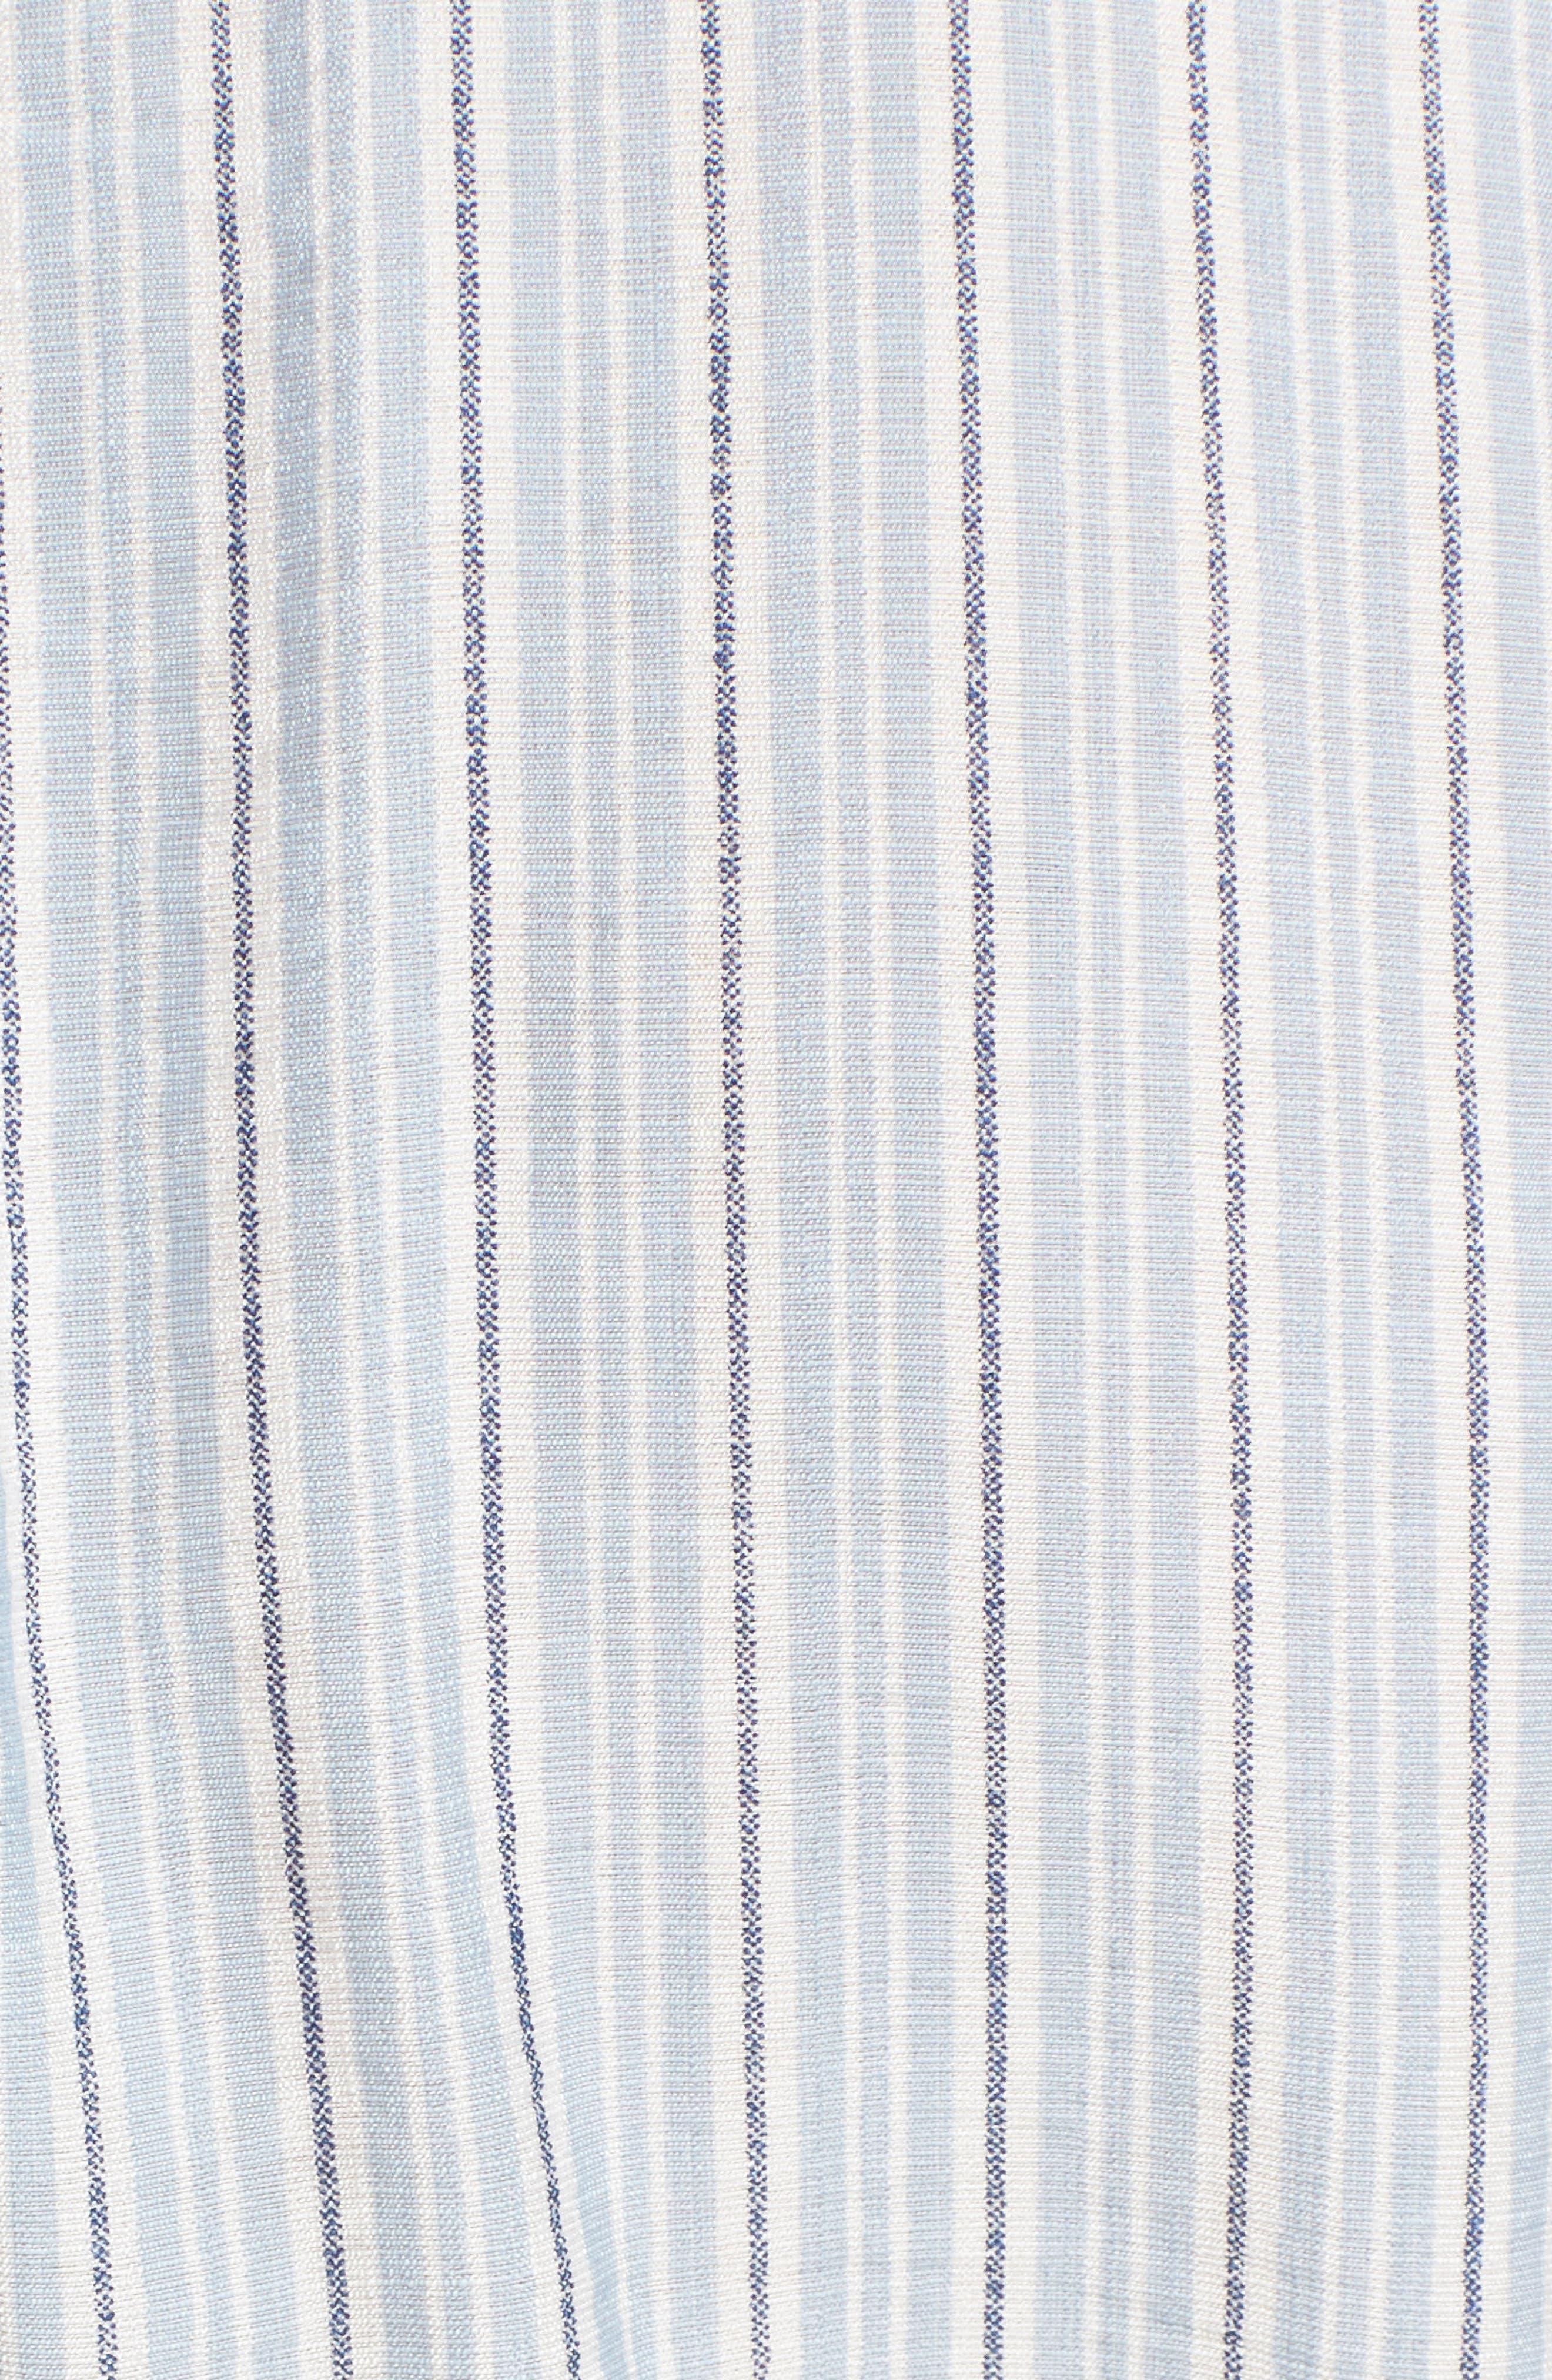 Stripe Ruffle Wrap Dress,                             Alternate thumbnail 5, color,